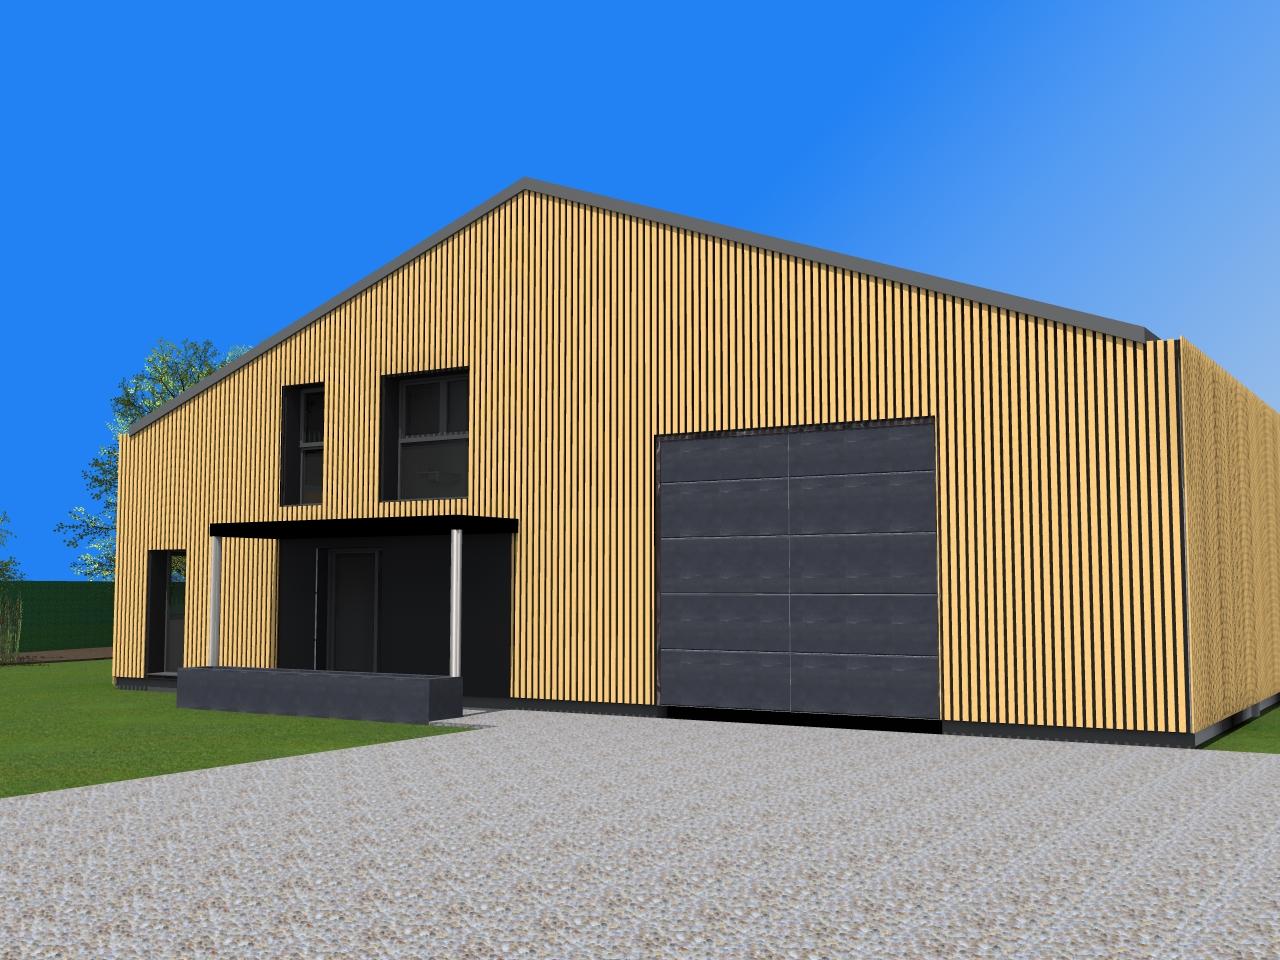 transformation d un hangar en loft amiot arnoux architectes. Black Bedroom Furniture Sets. Home Design Ideas